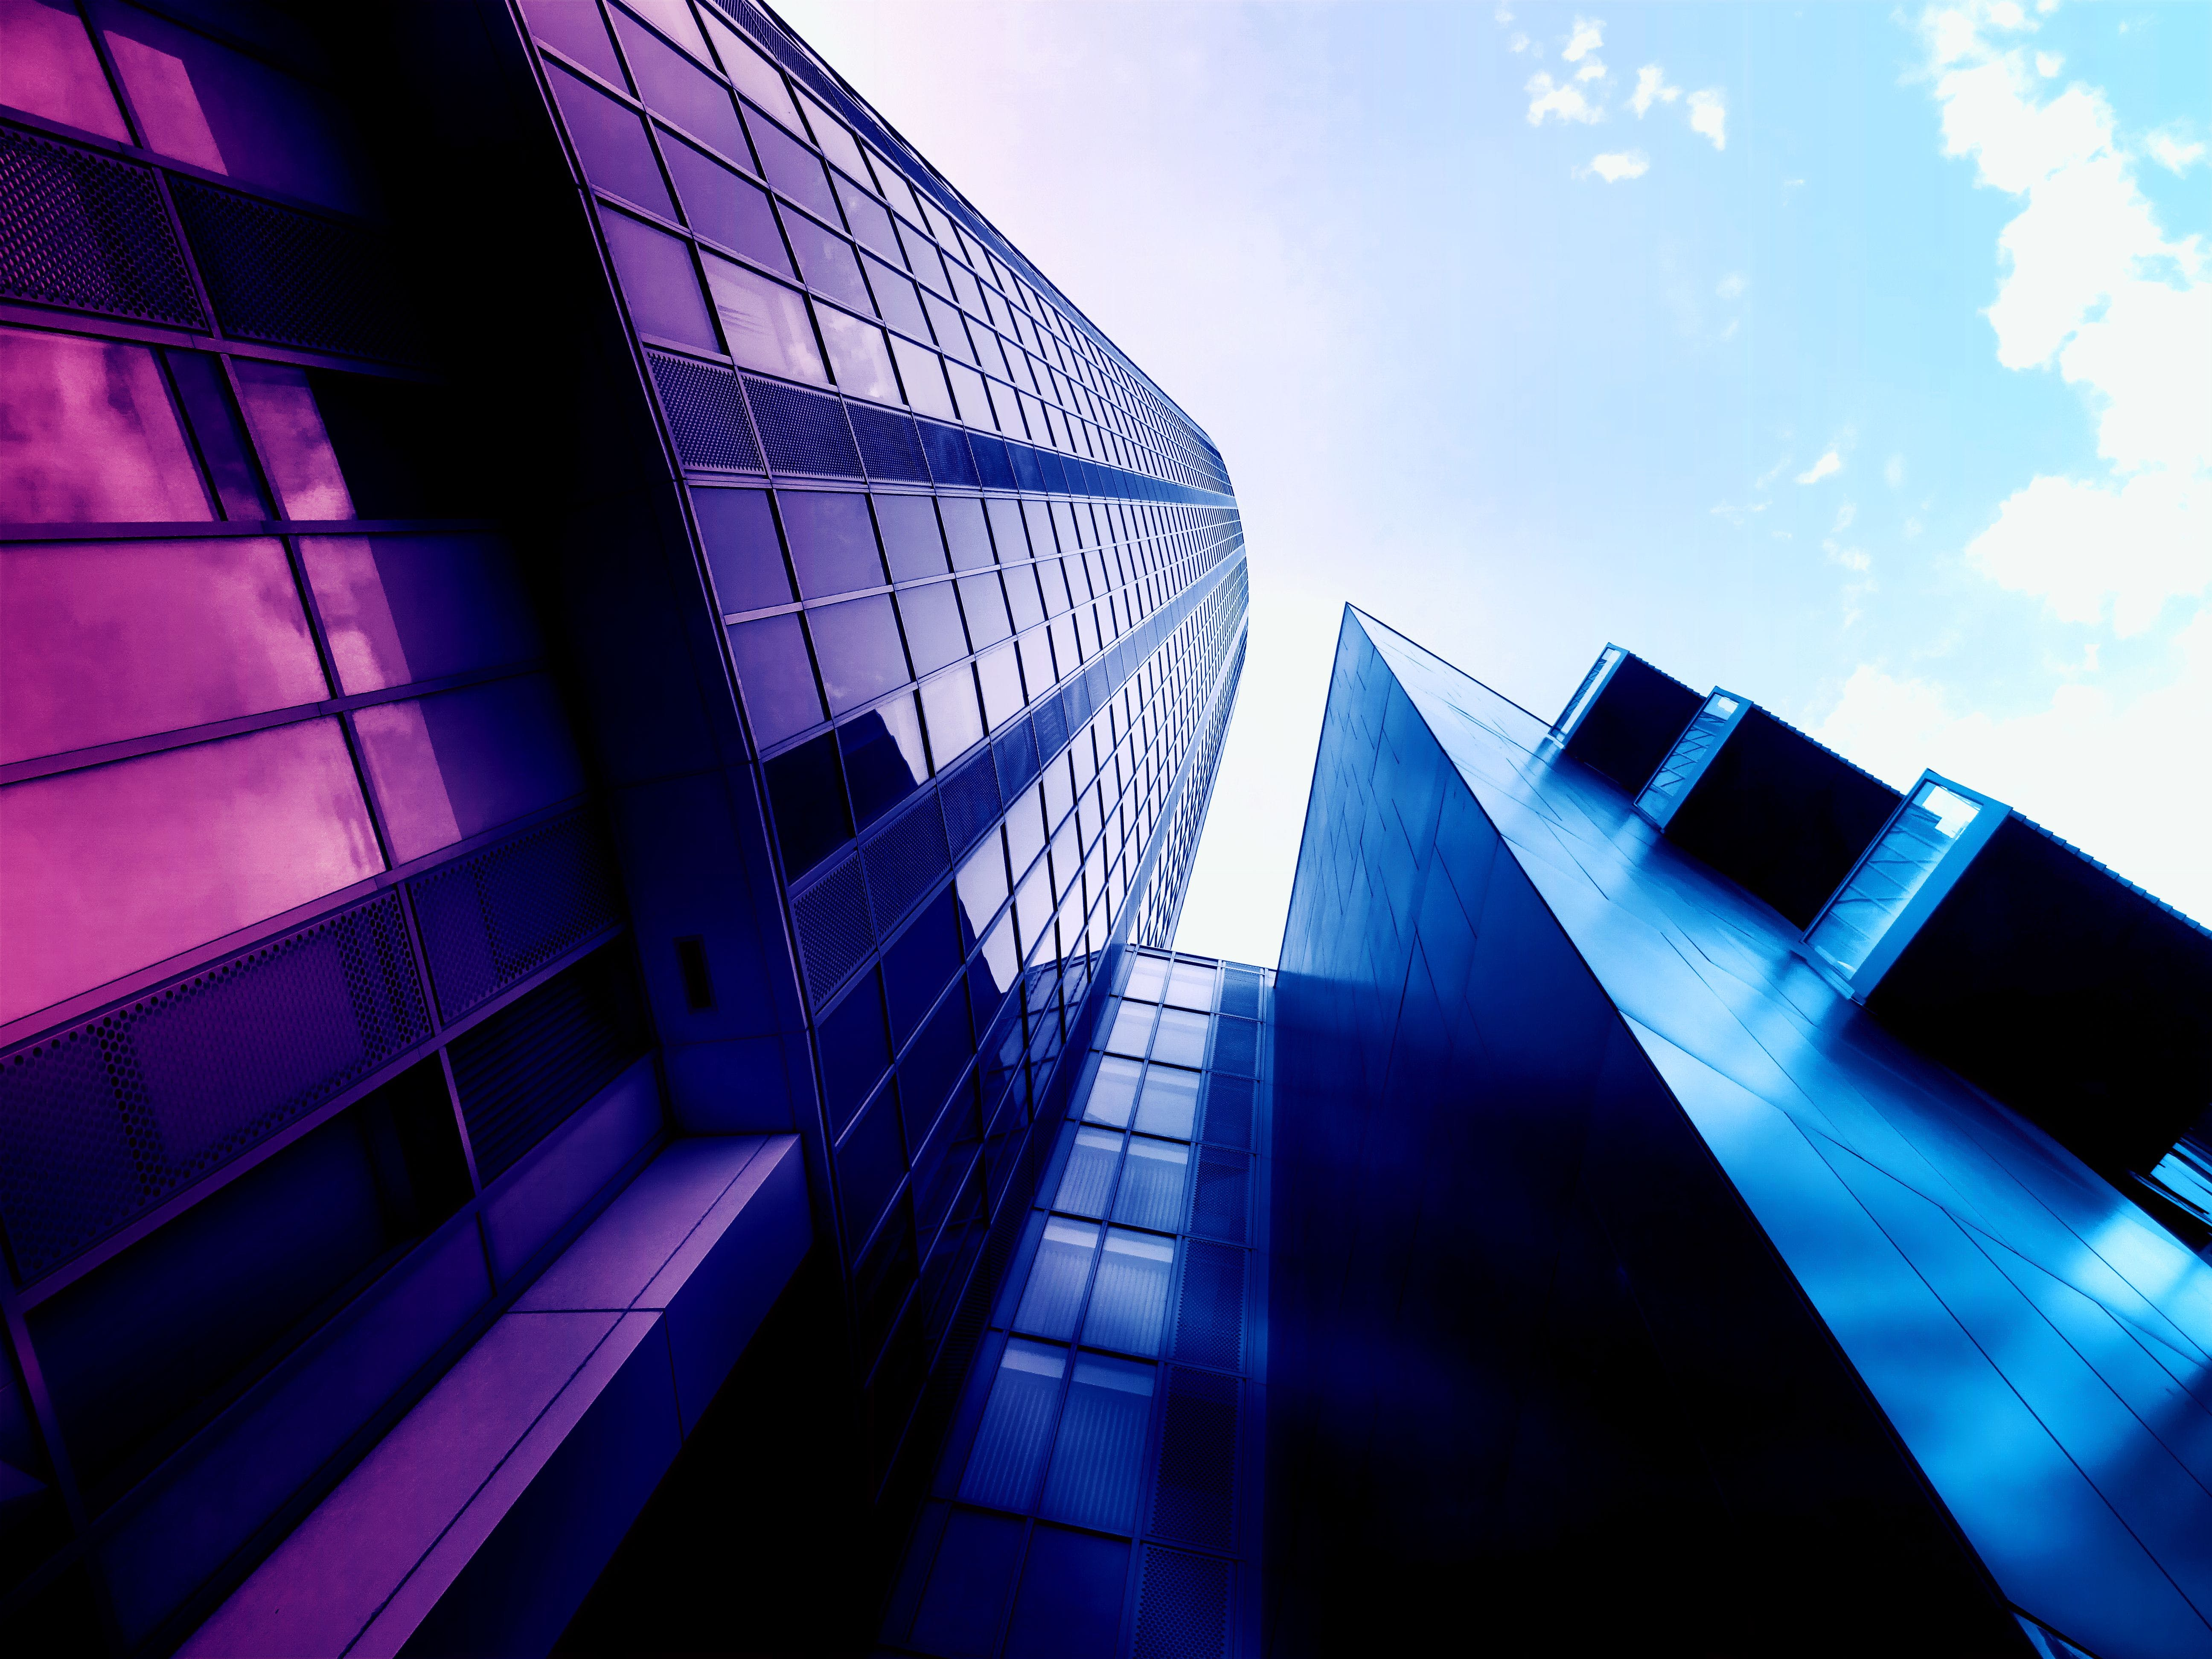 High-rise Building Digital Wallpaper